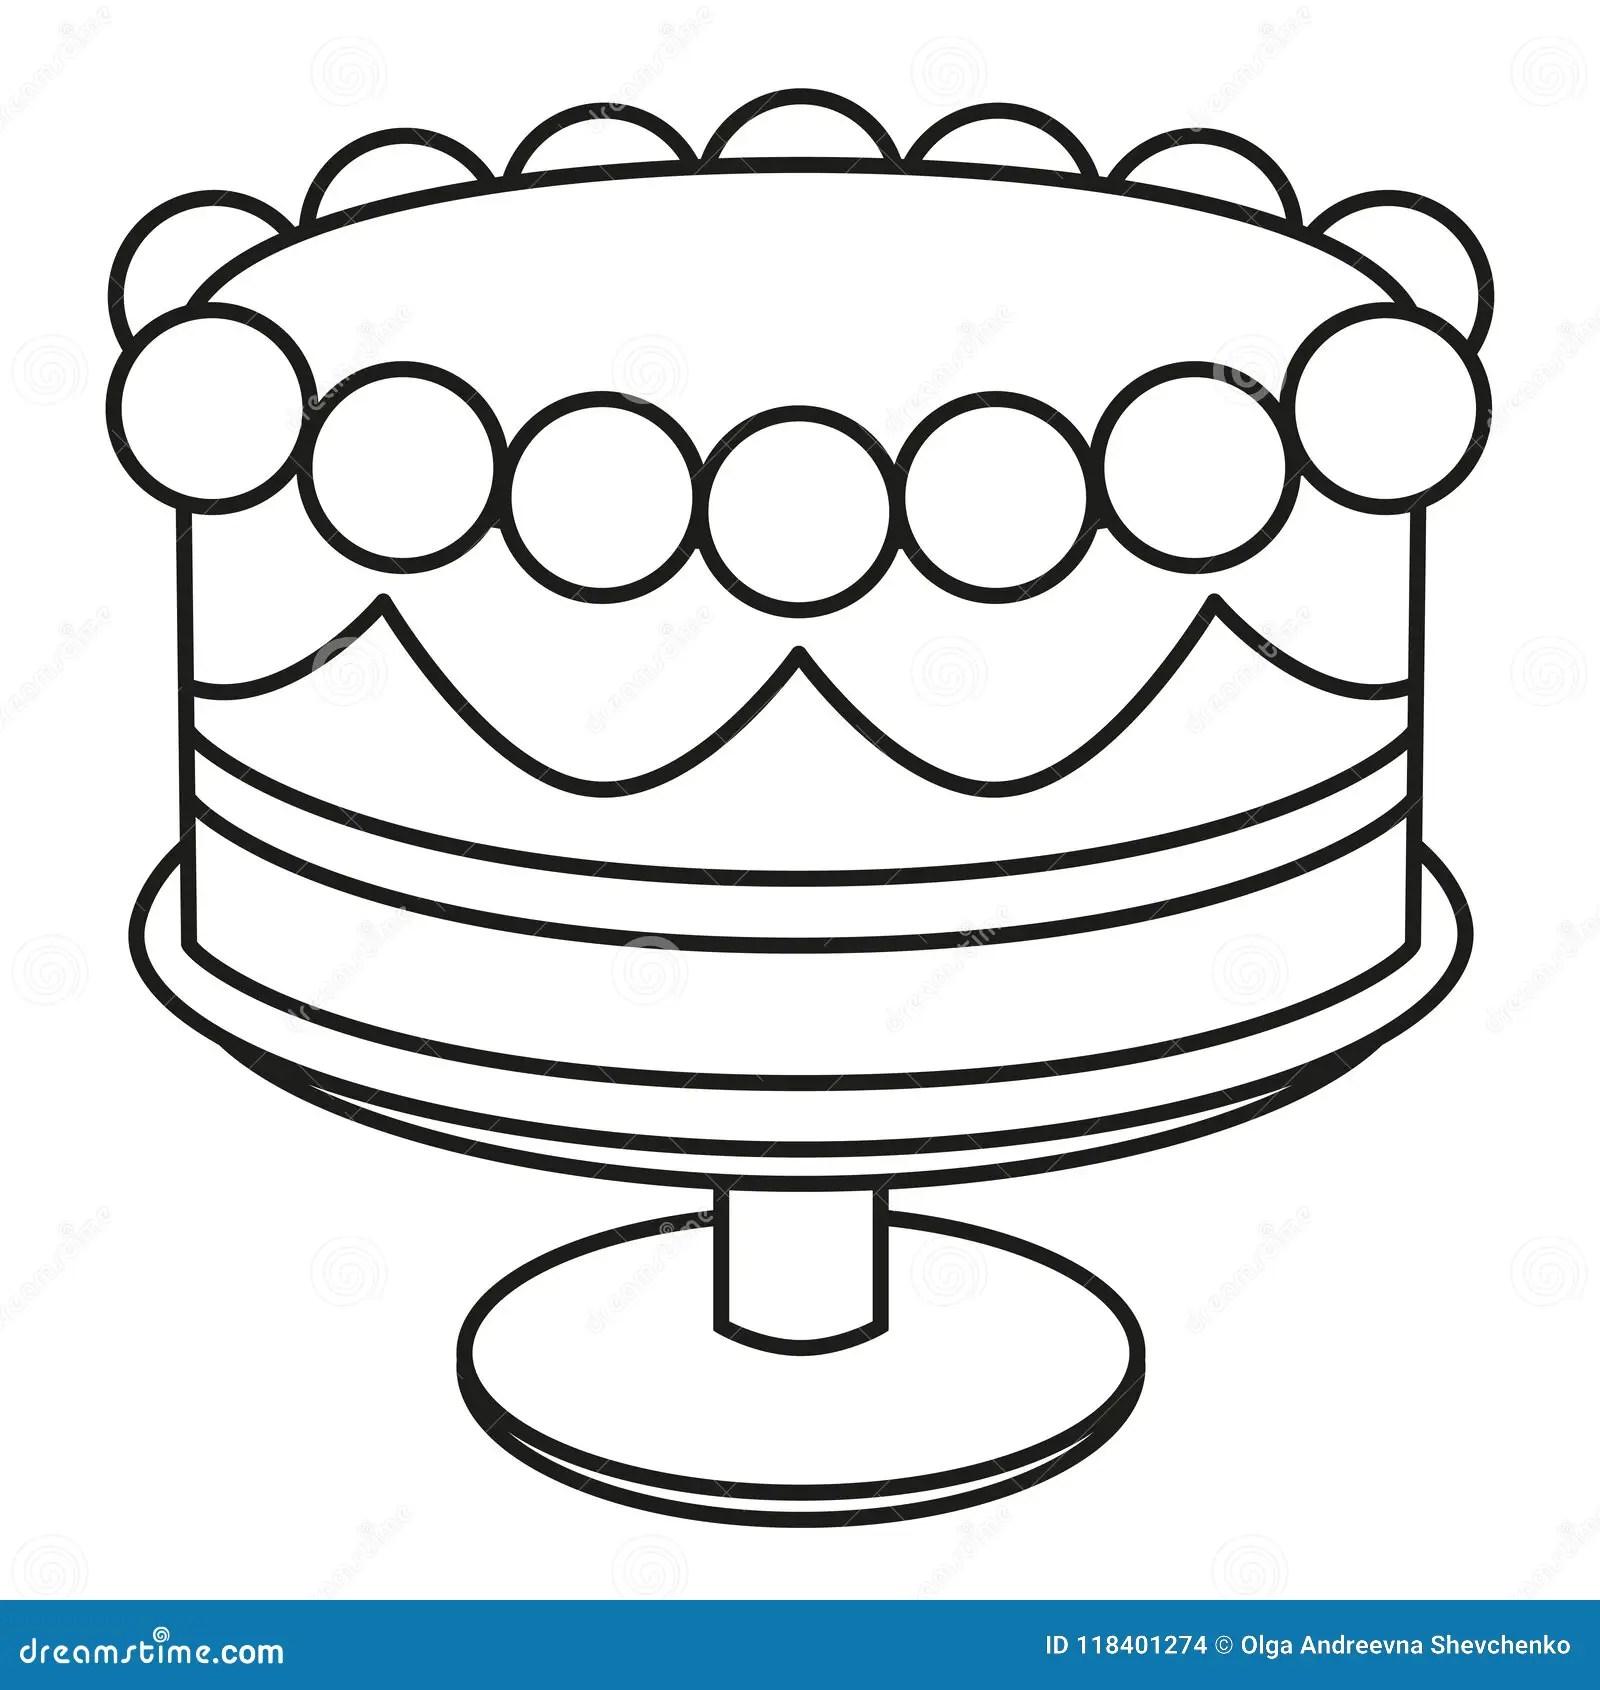 Line Art Black And White Birthday Cake On Stand Stock